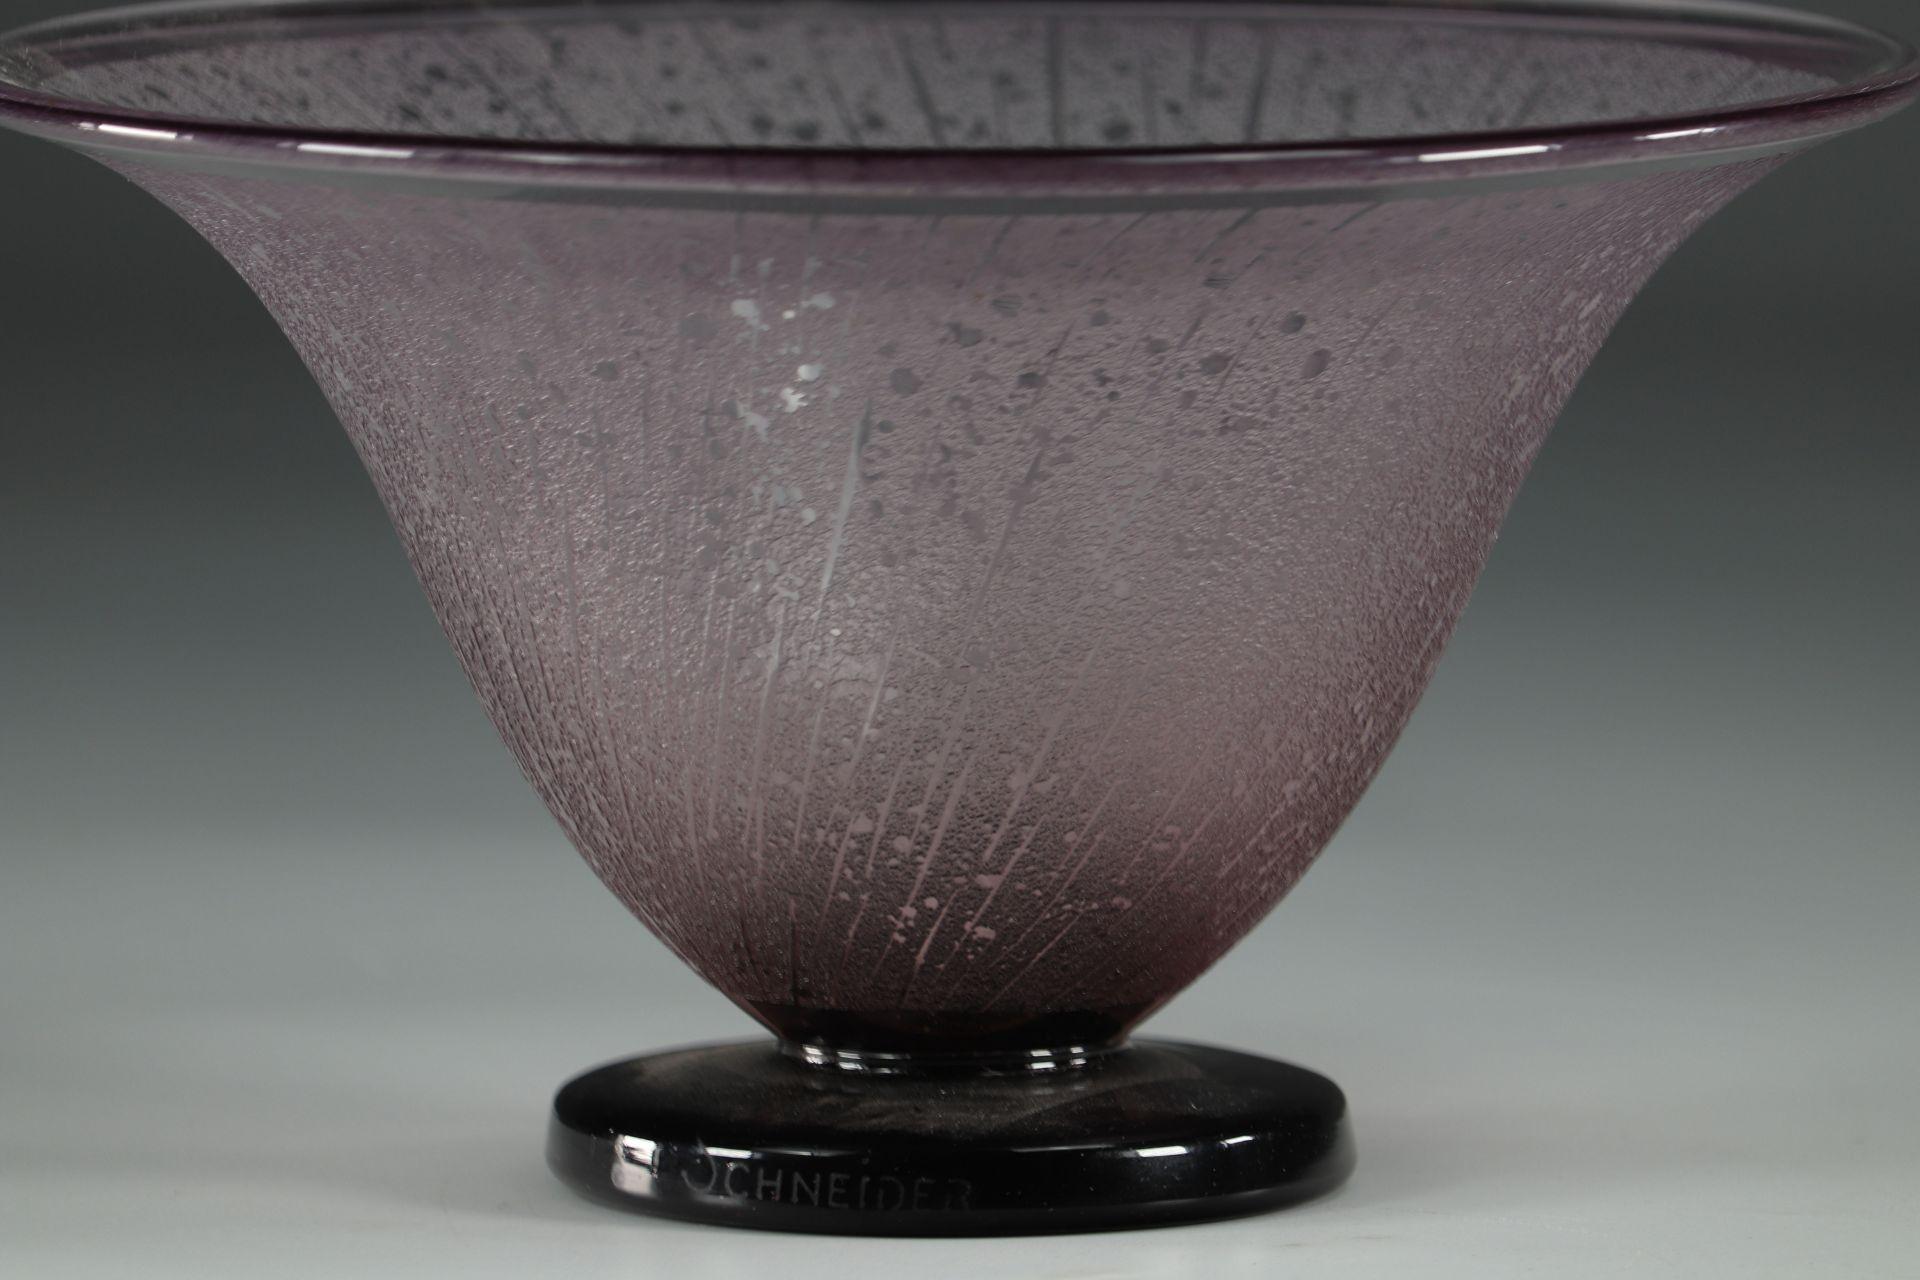 Schneider Acid-Cleared Art Deco Cut - Image 3 of 3